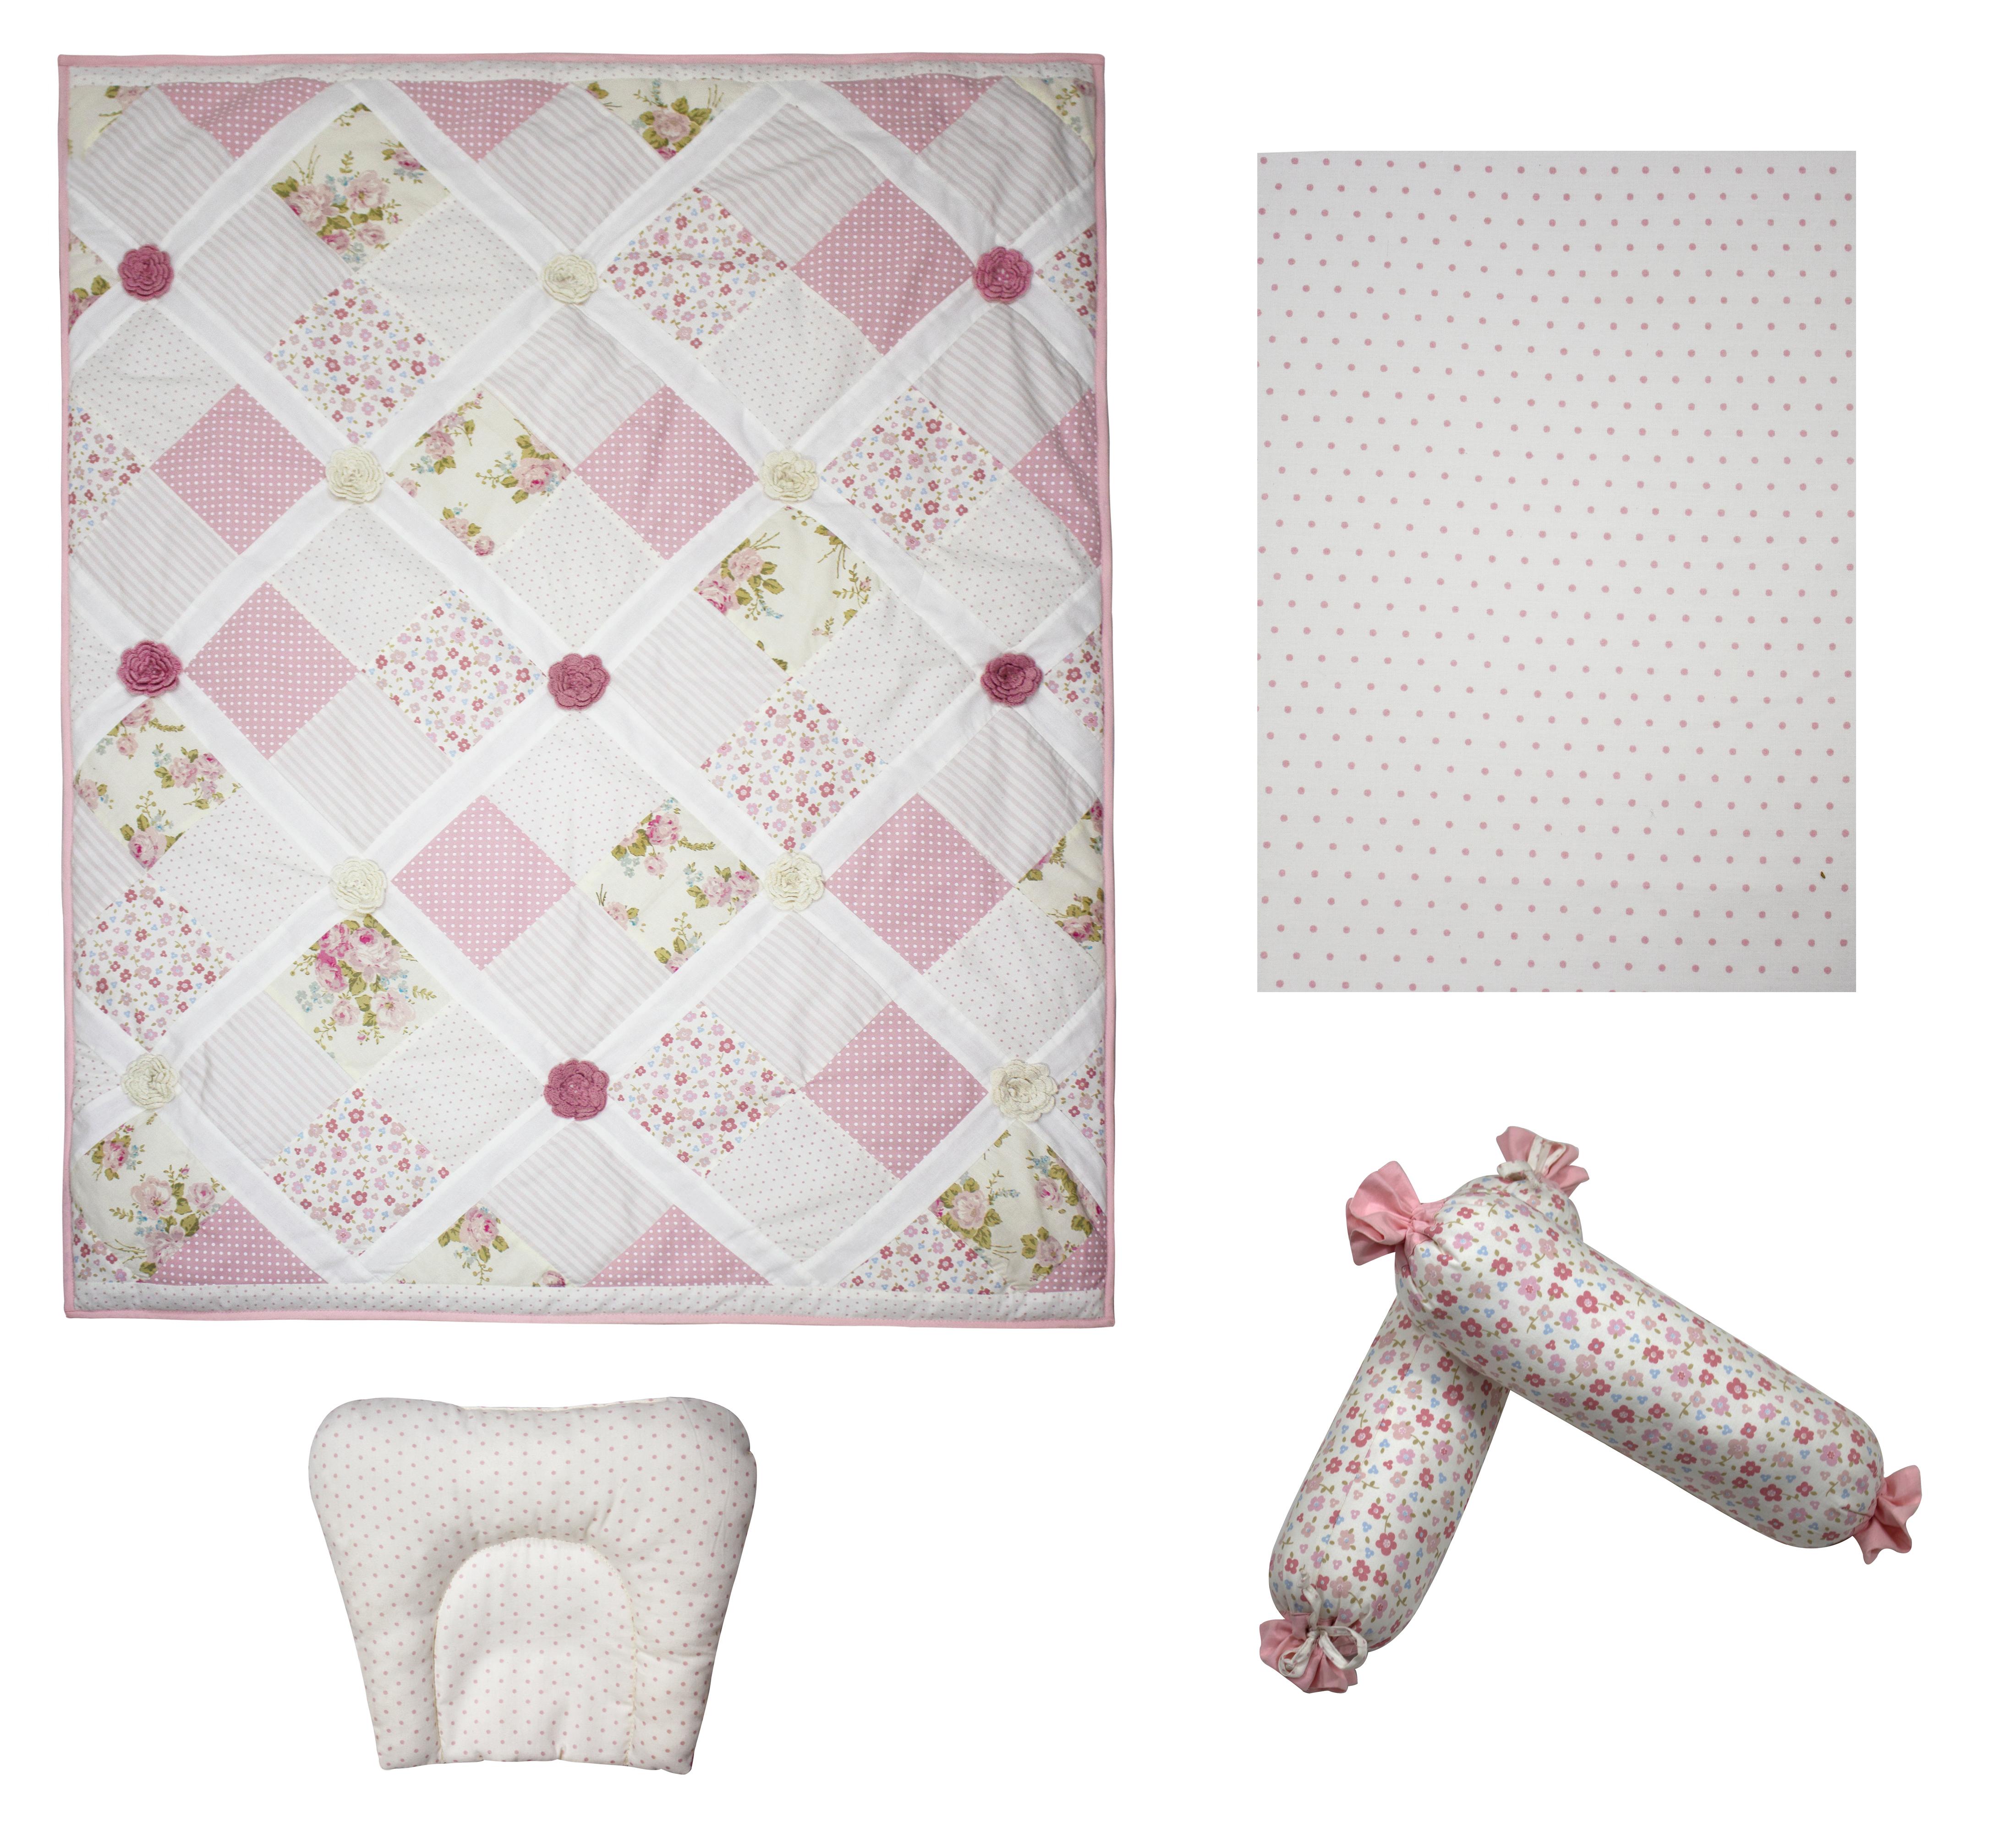 Mothercare | Abracadabra 5 Piece Cot Bedding Set - Vintage Floral